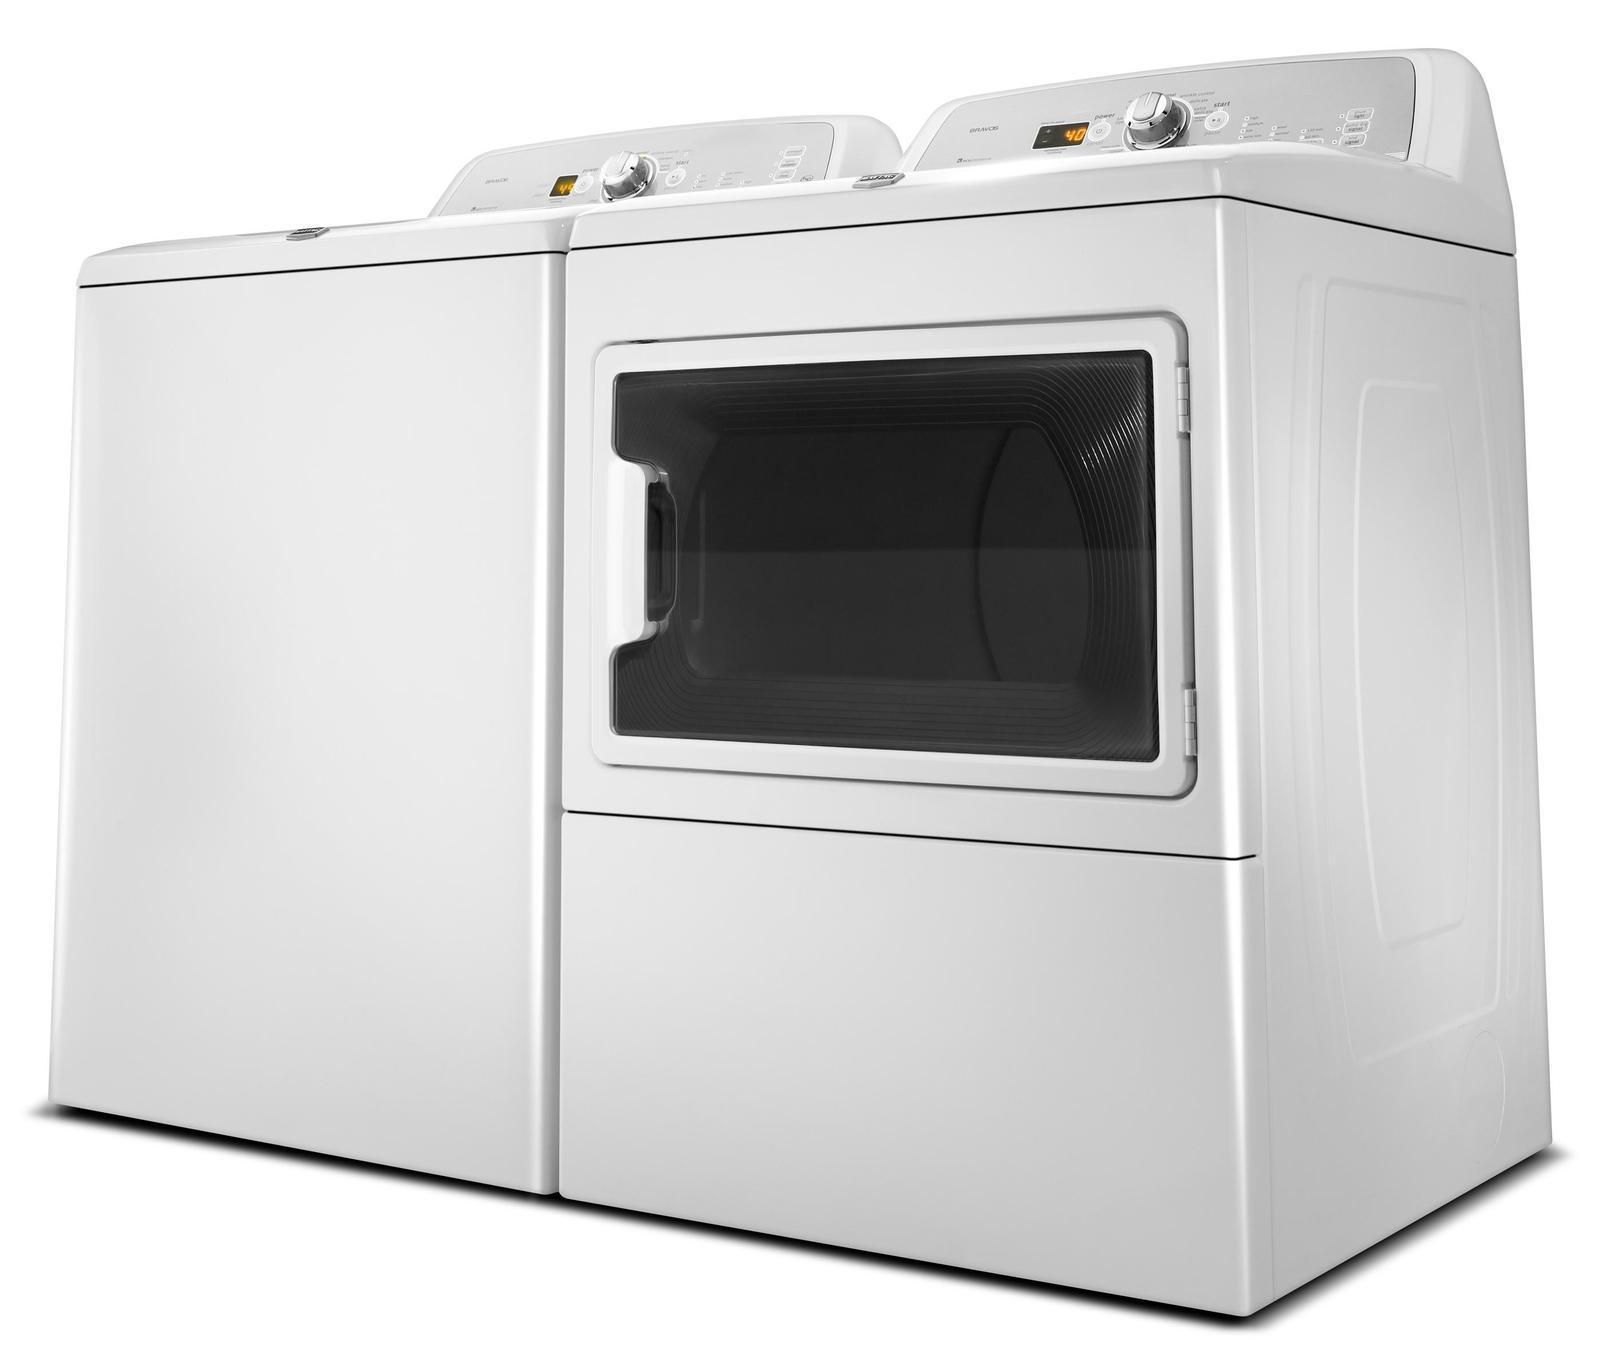 Mgdx700xl Maytag Mgdx700xl Bravos X Series Gas Dryers